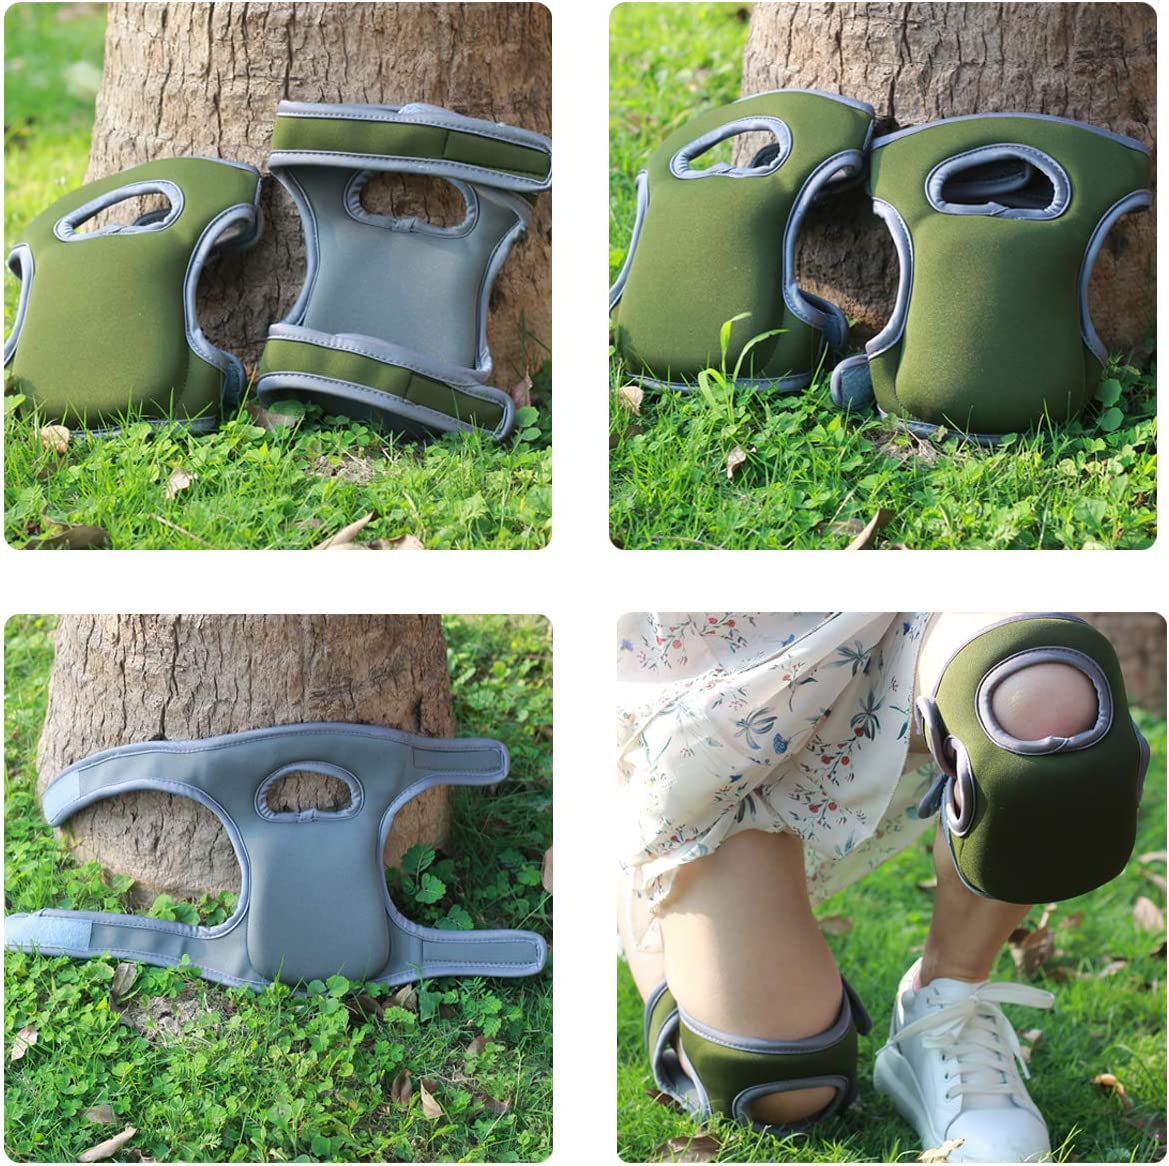 Gaosheng 1 Pair Gardening Knee Pads Protective Cushion Garden Knee Pad Comfortable Short Knee Pads for Work and Gardening